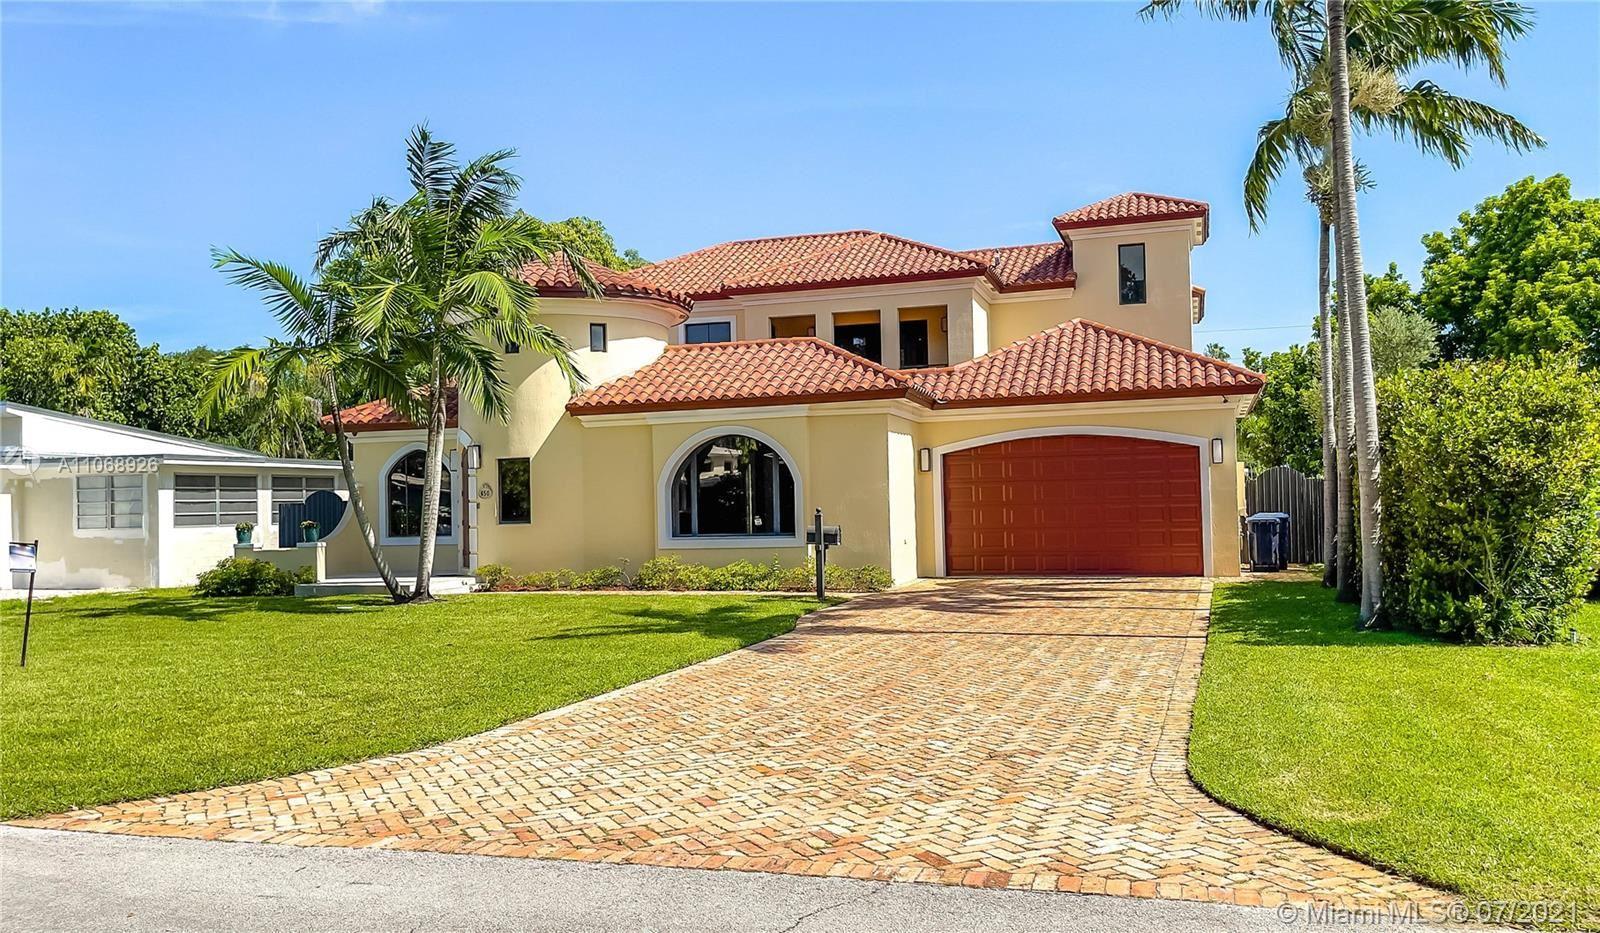 650 Raven Ave, Miami Springs, FL 33166 - #: A11068926